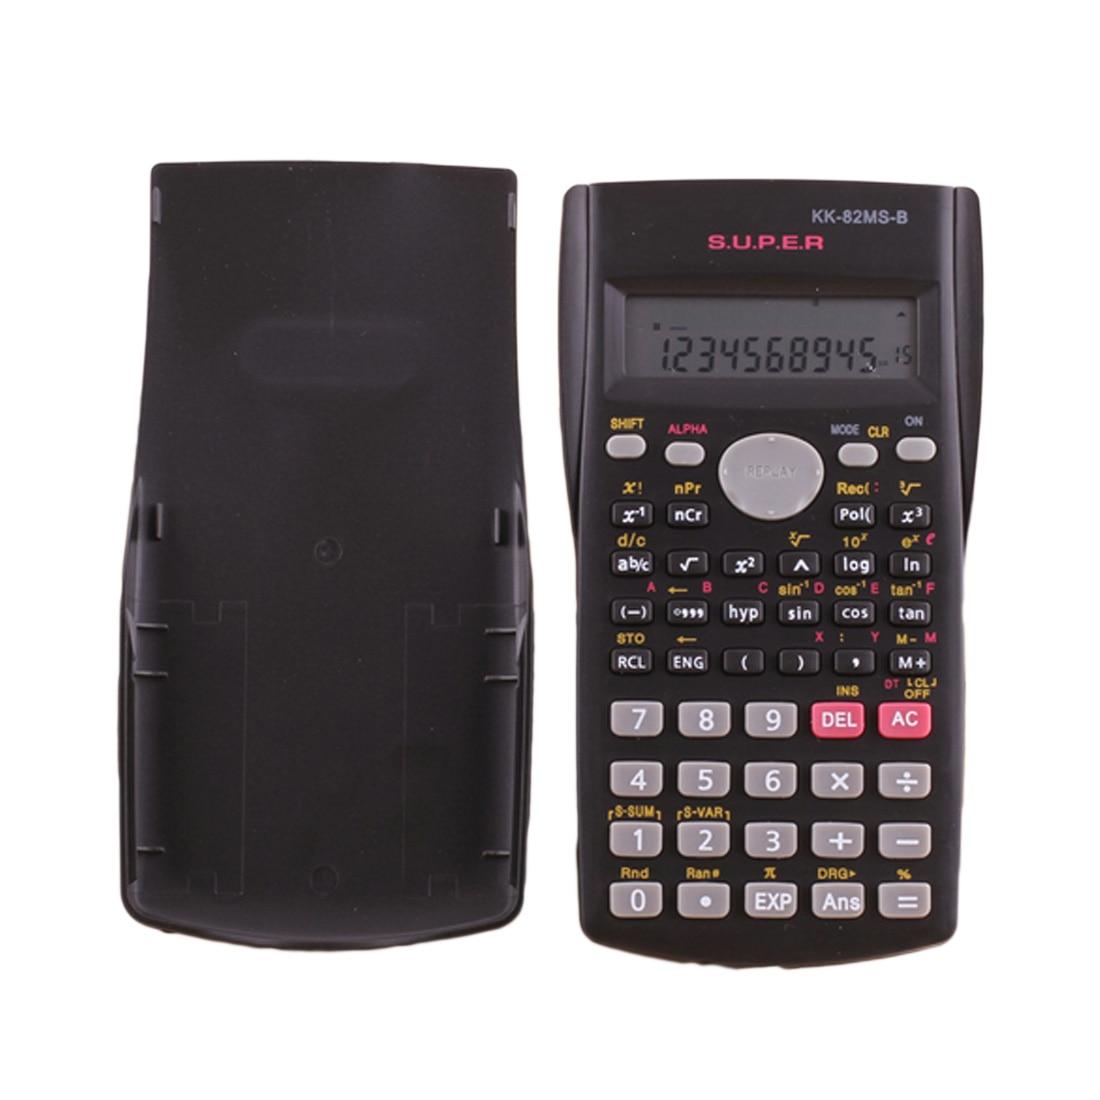 NOYOKERE Function Calculator Handheld Multi-function 2-Line Display Digital LCD Scientific Calculator Wholesale